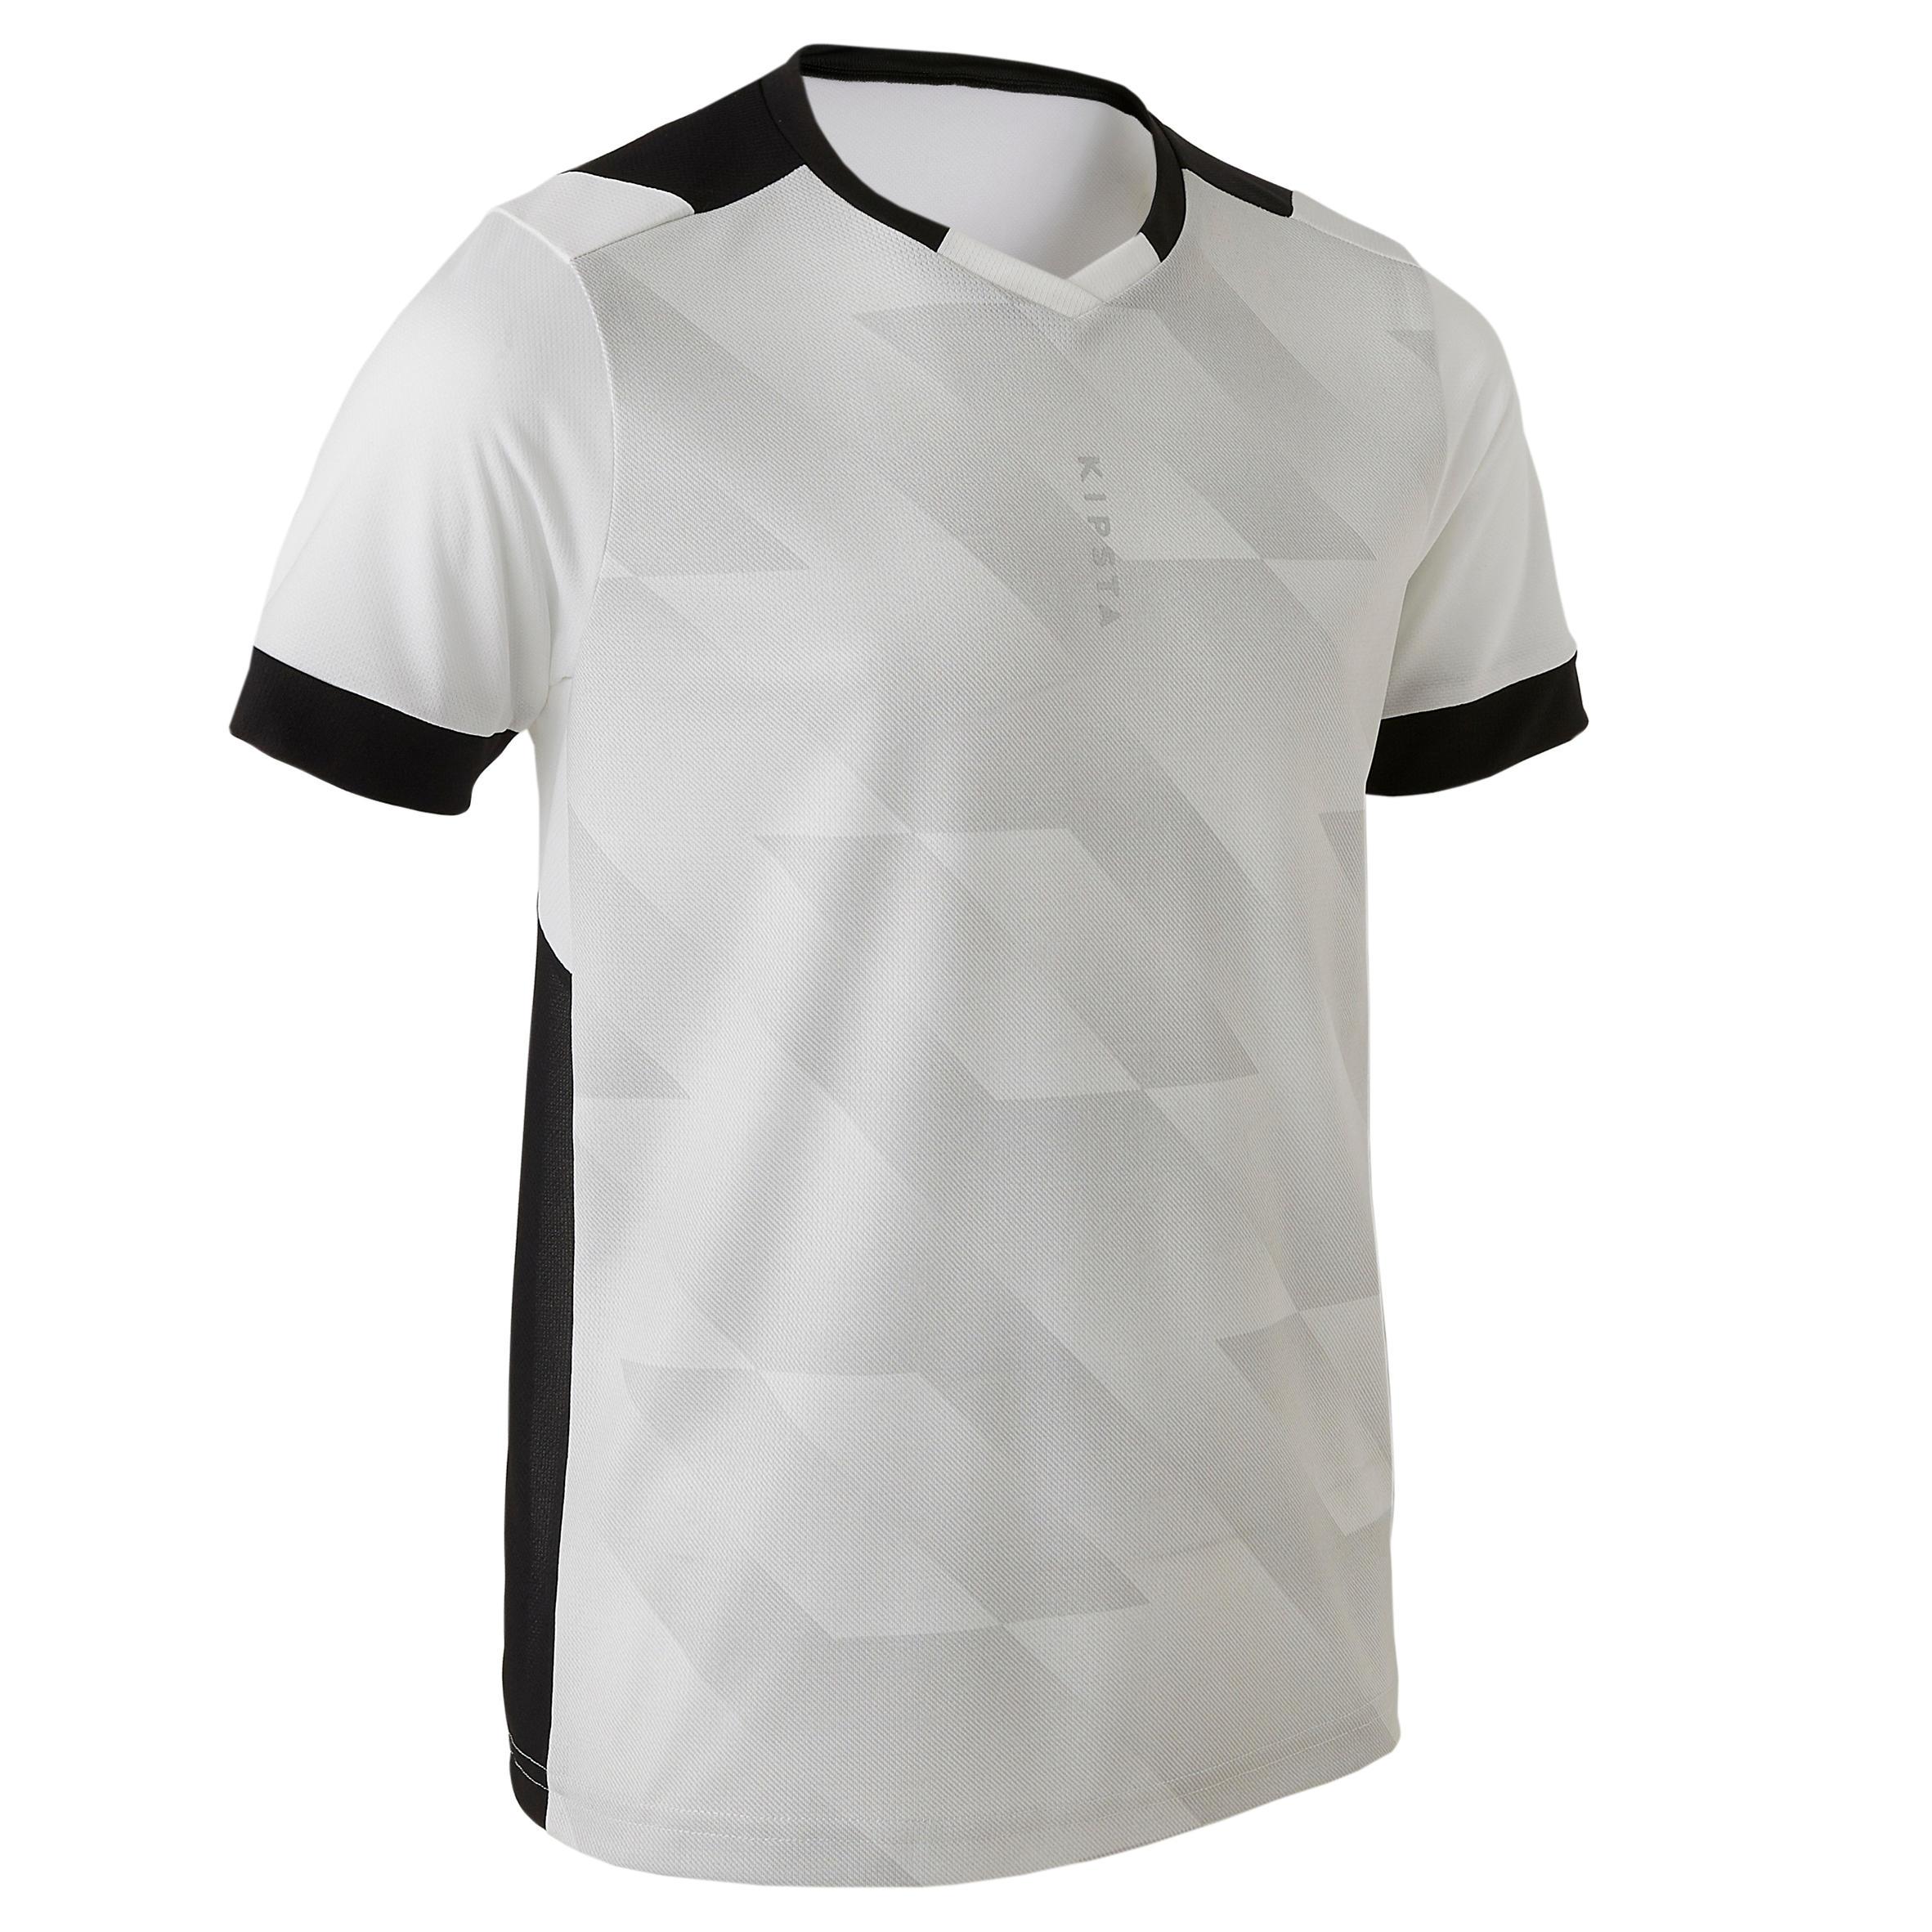 Kipsta Voetbalshirt kind F500 wit/zwart